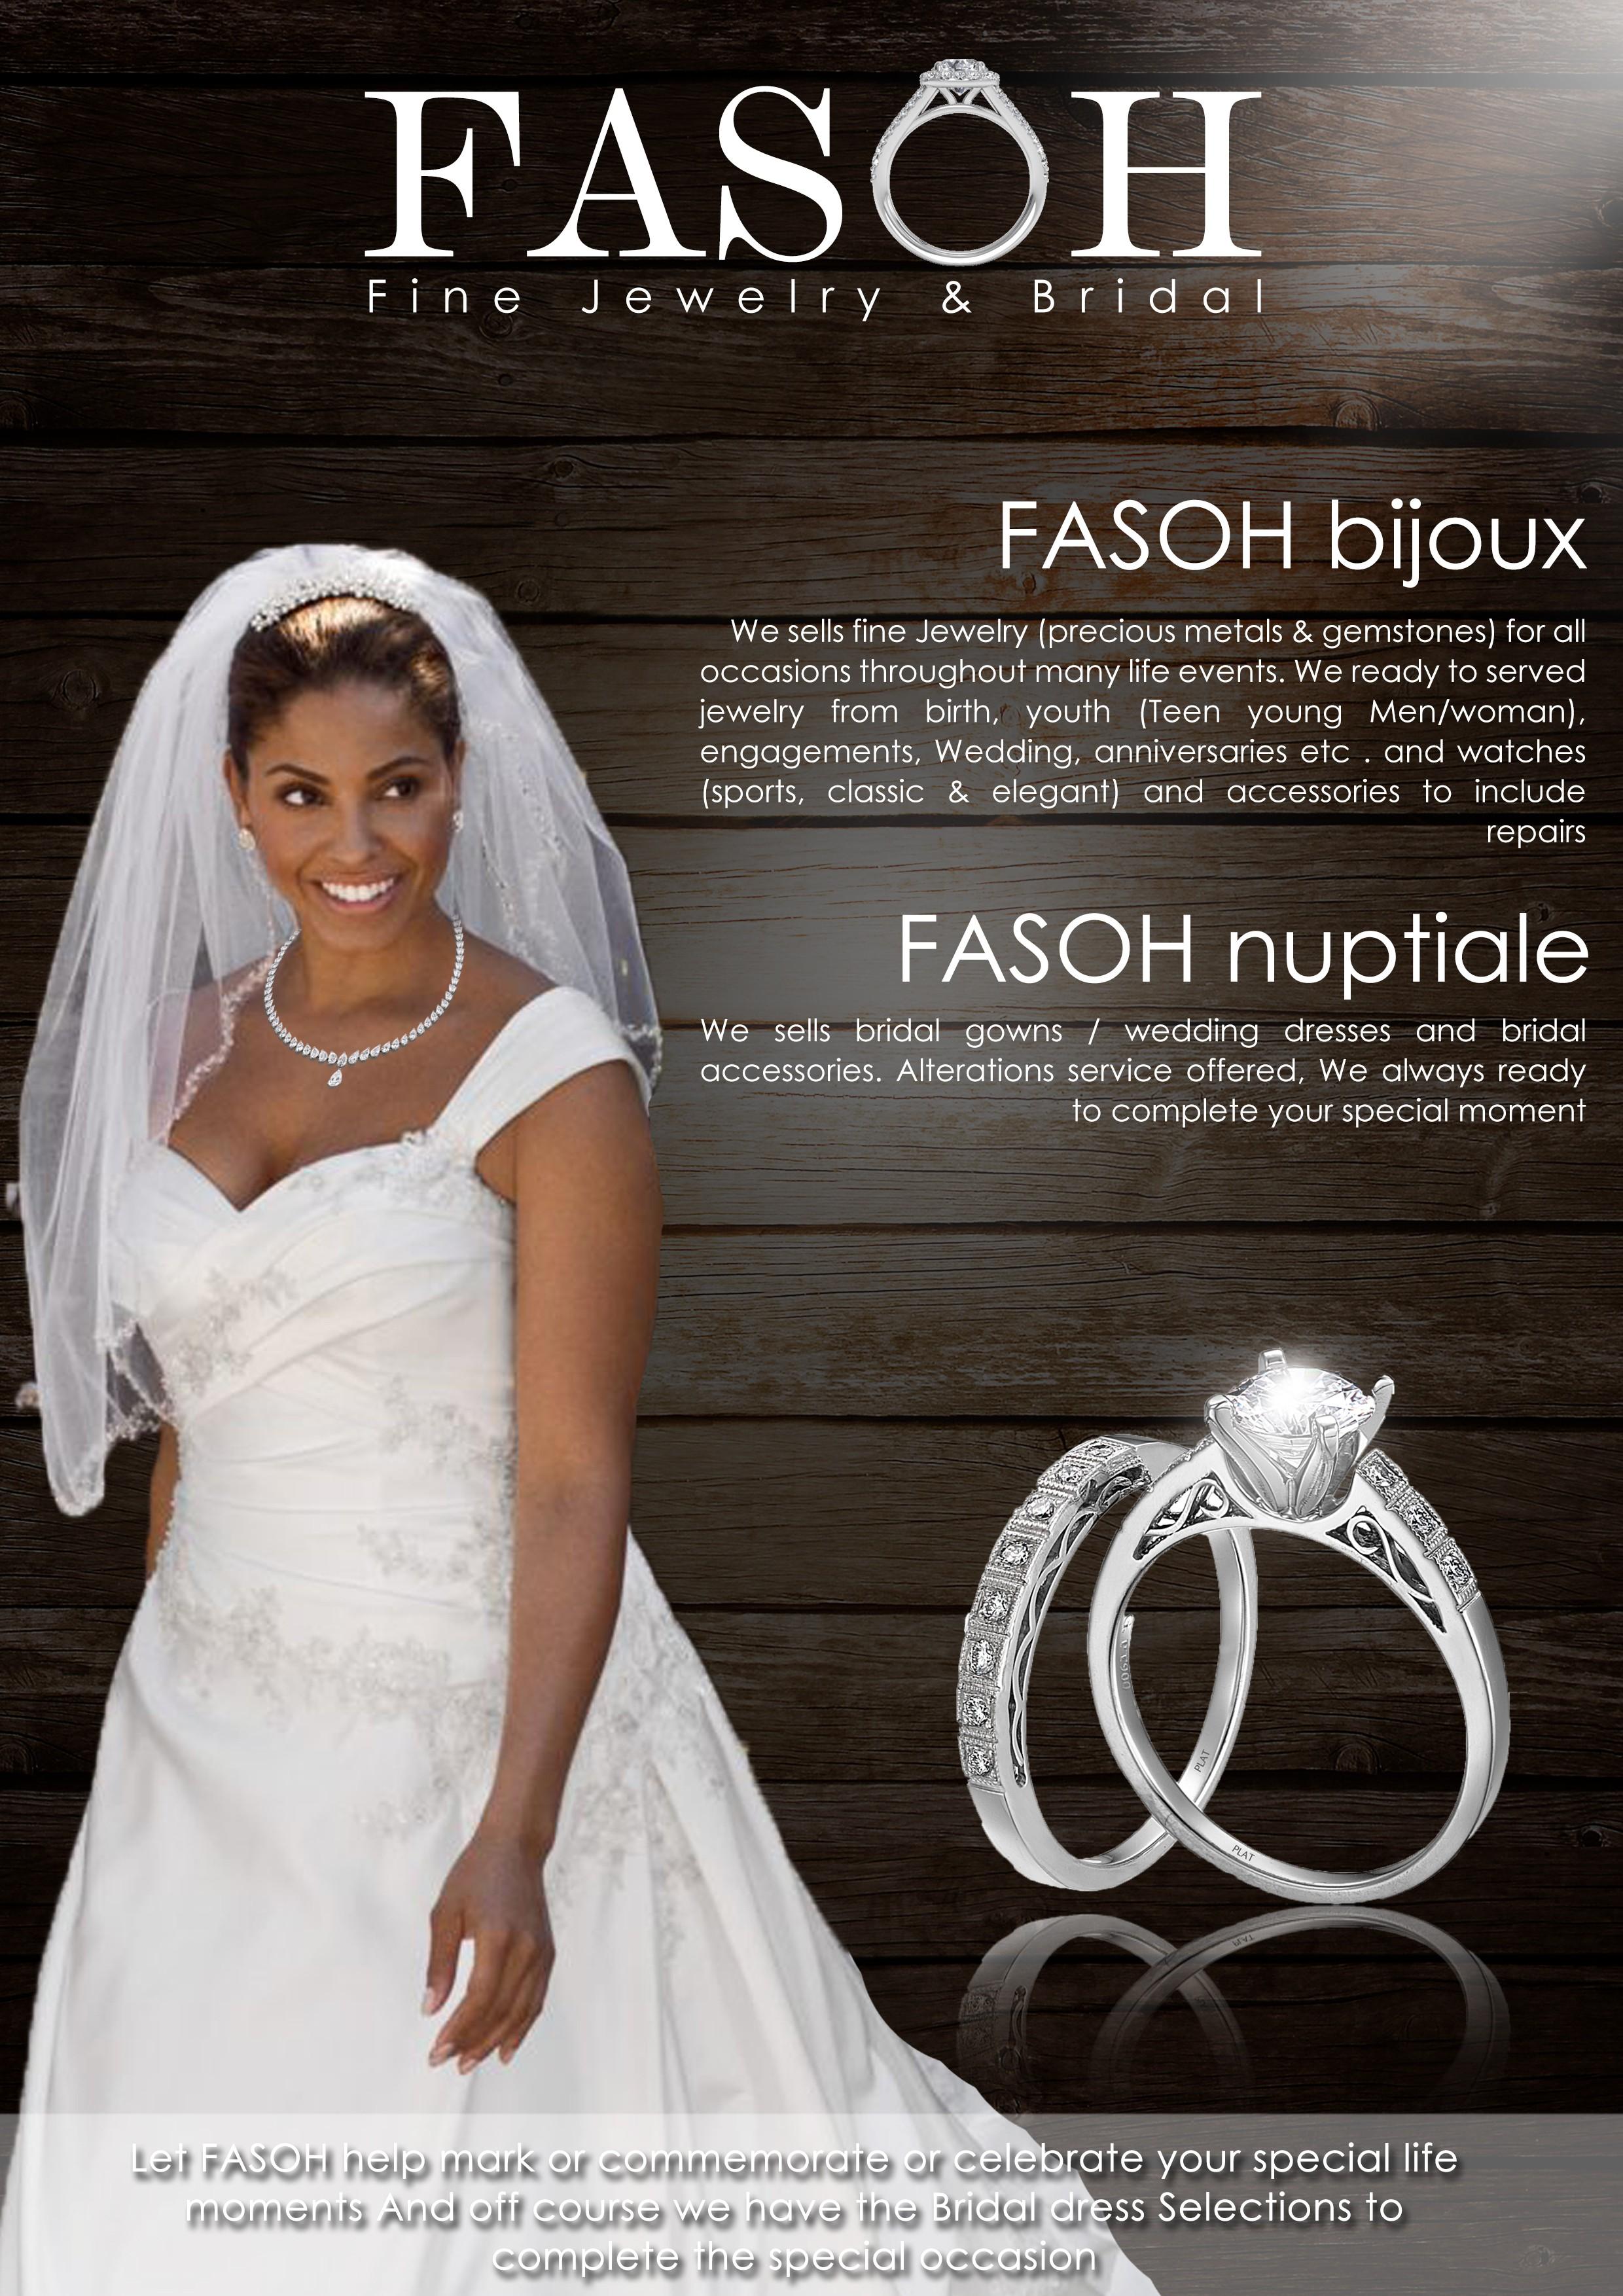 Fasoh fine  Jewelry & Bridal